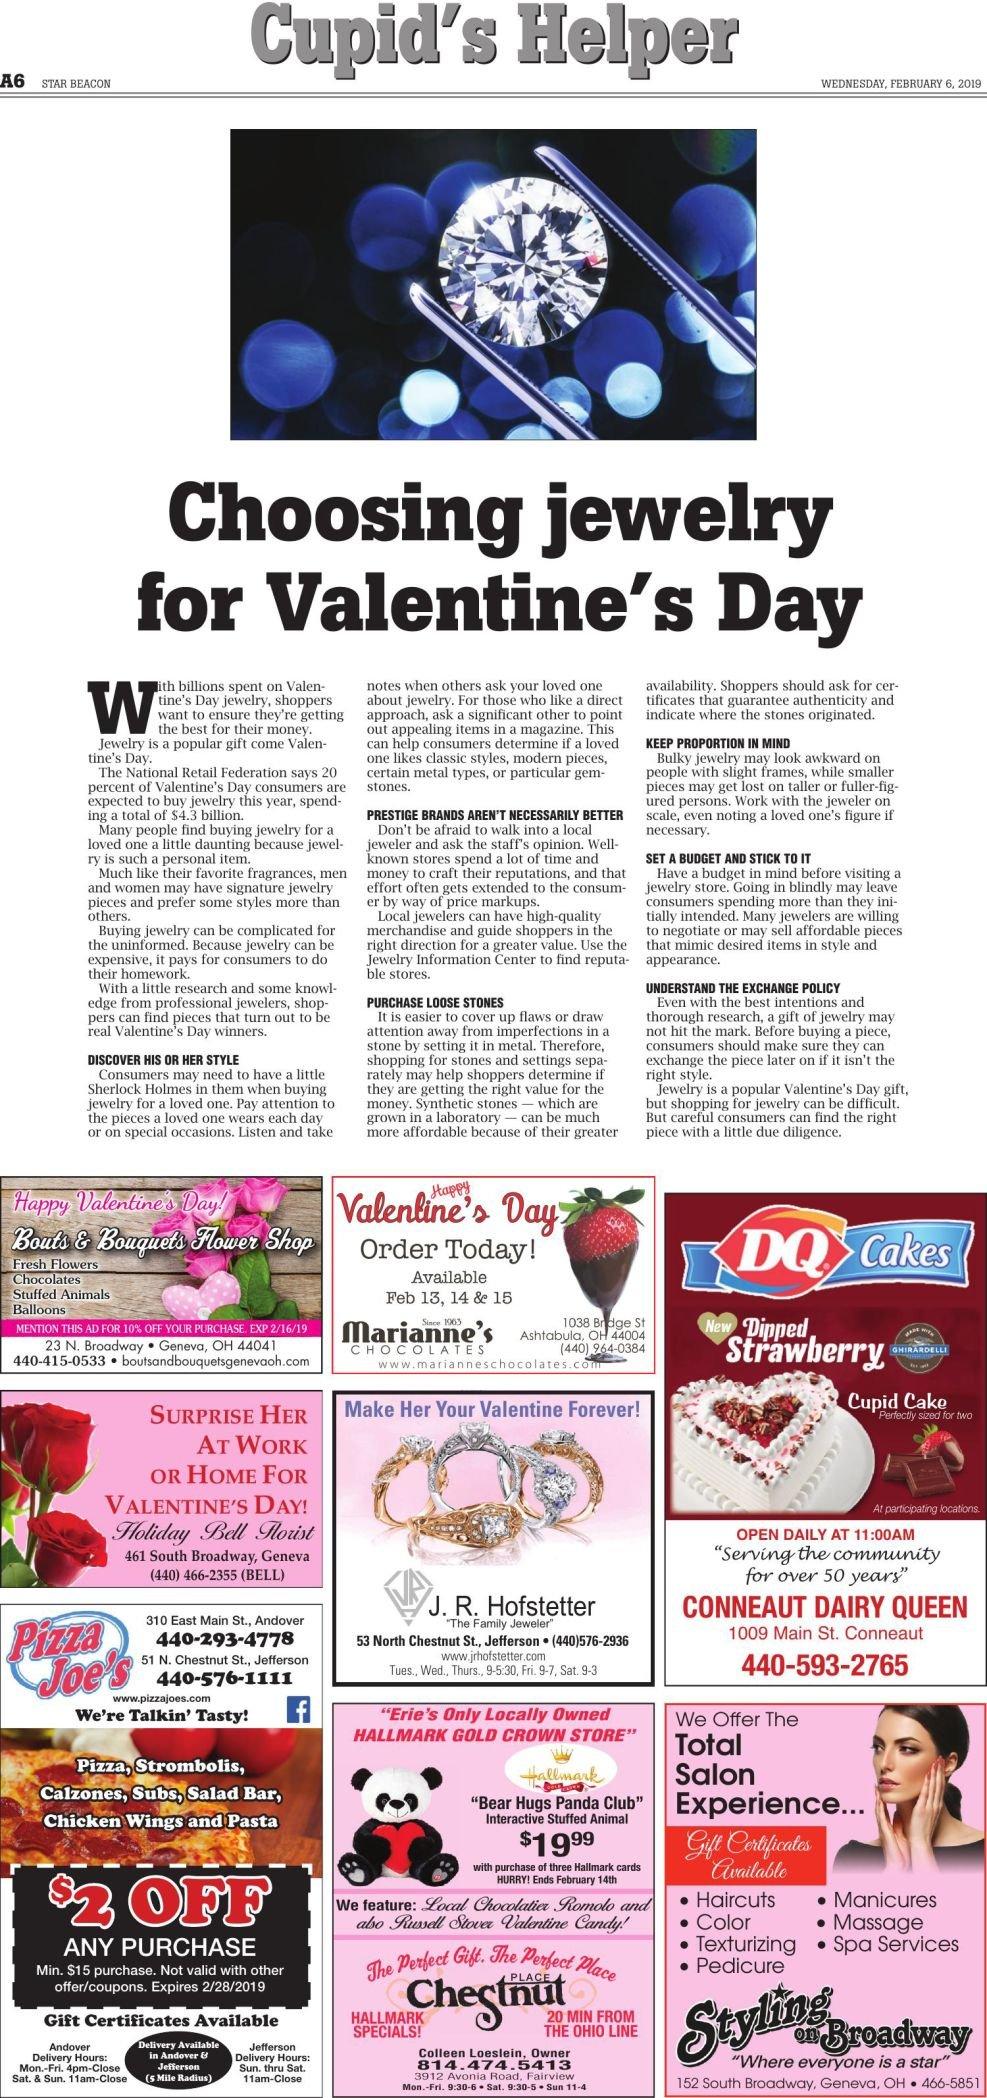 Valentine Page Wednesday, February 6, 2019